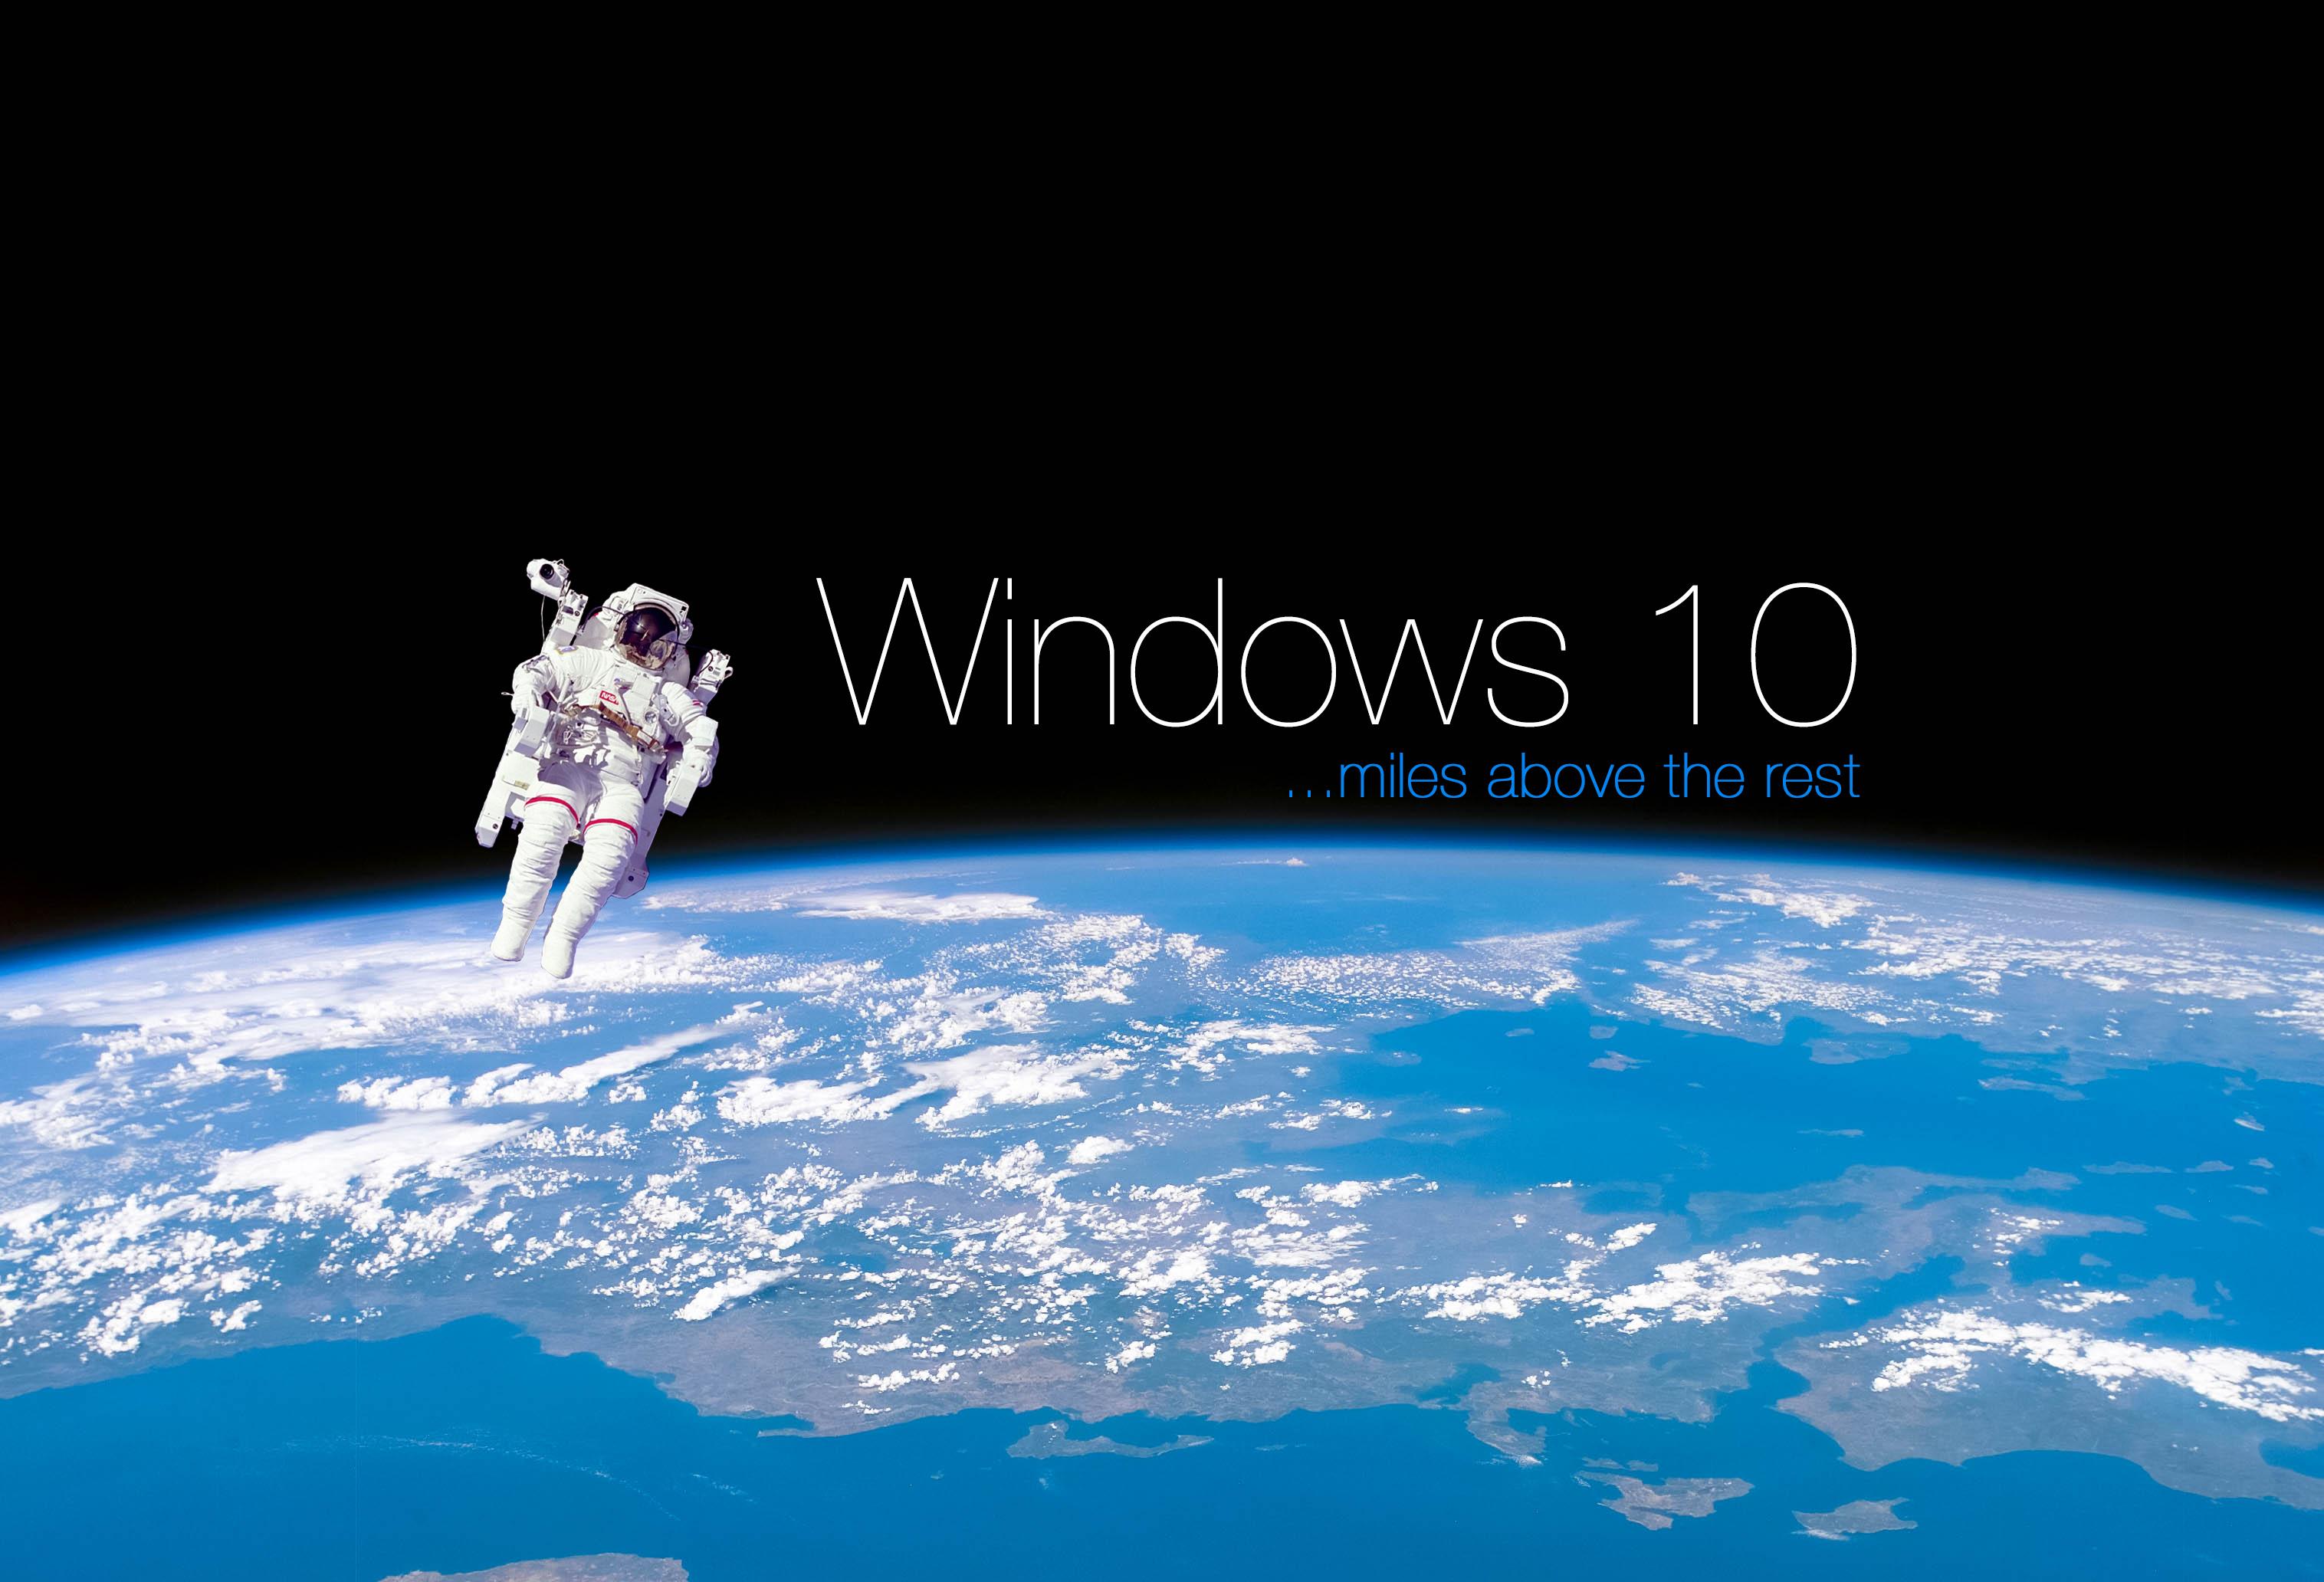 Windows 10 Wallpapers Desktop Backgrounds   4   HD Wallpapers 3032x2064